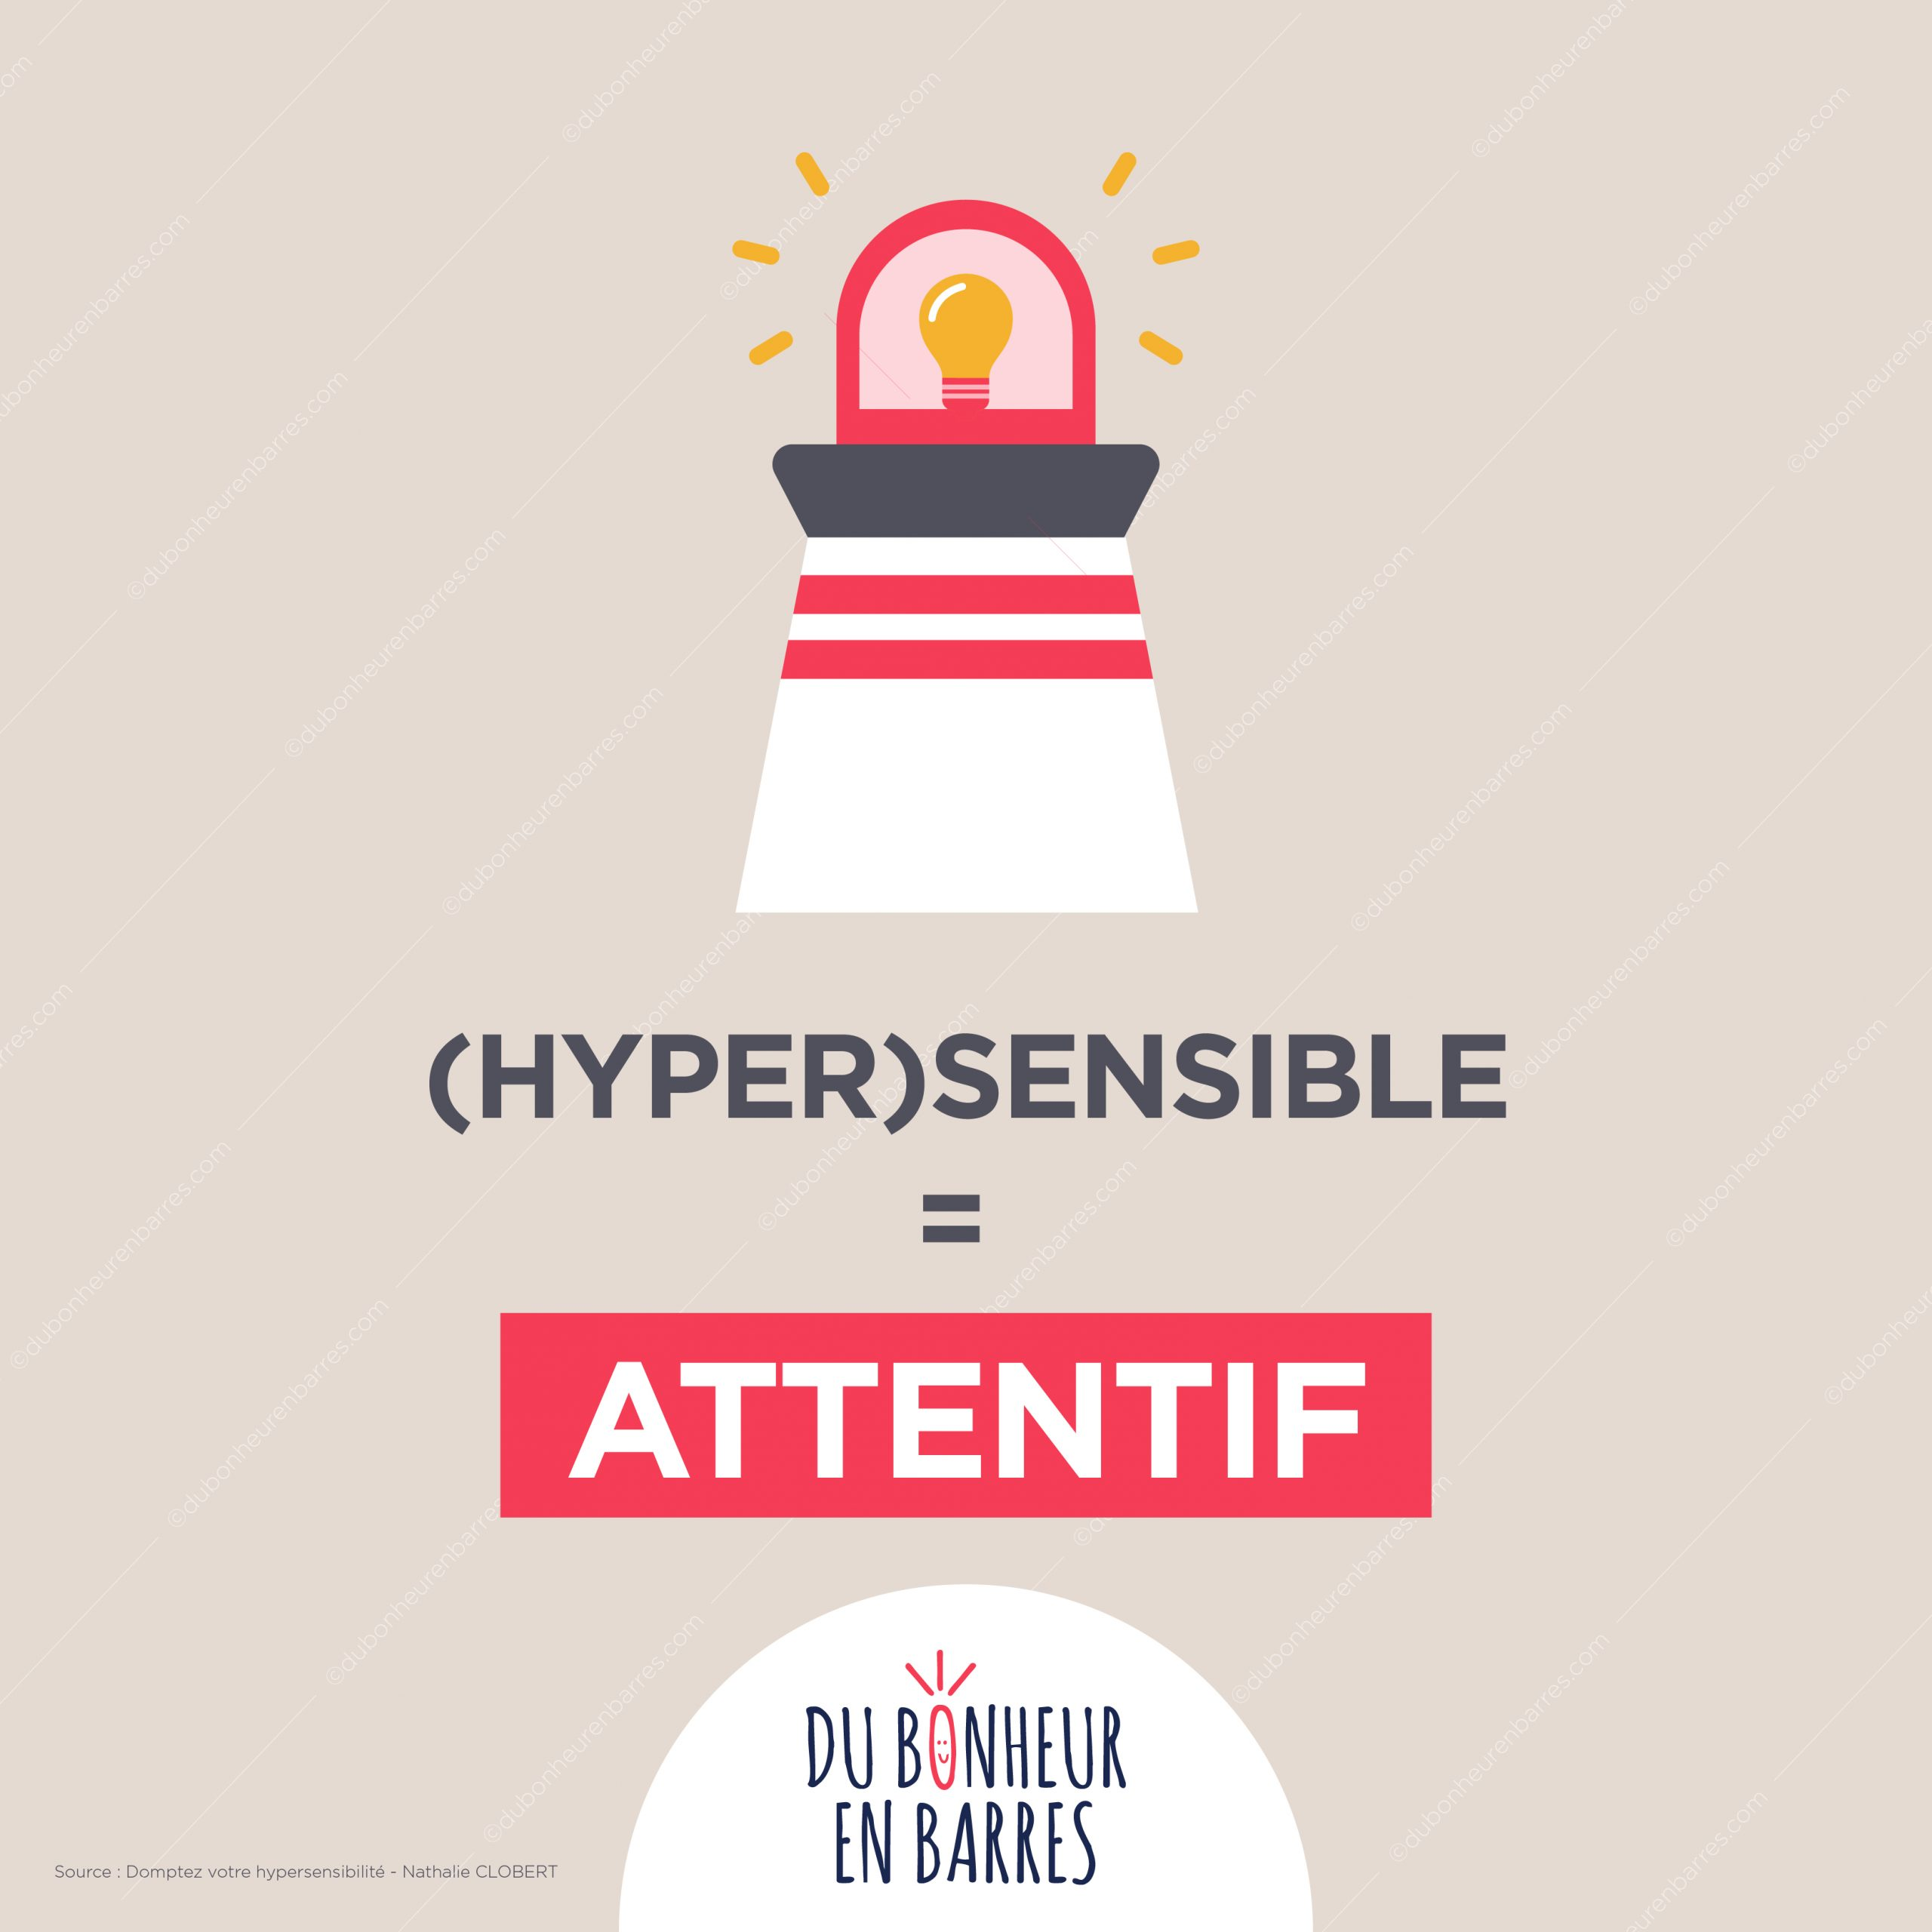 Hypersensible = attentif